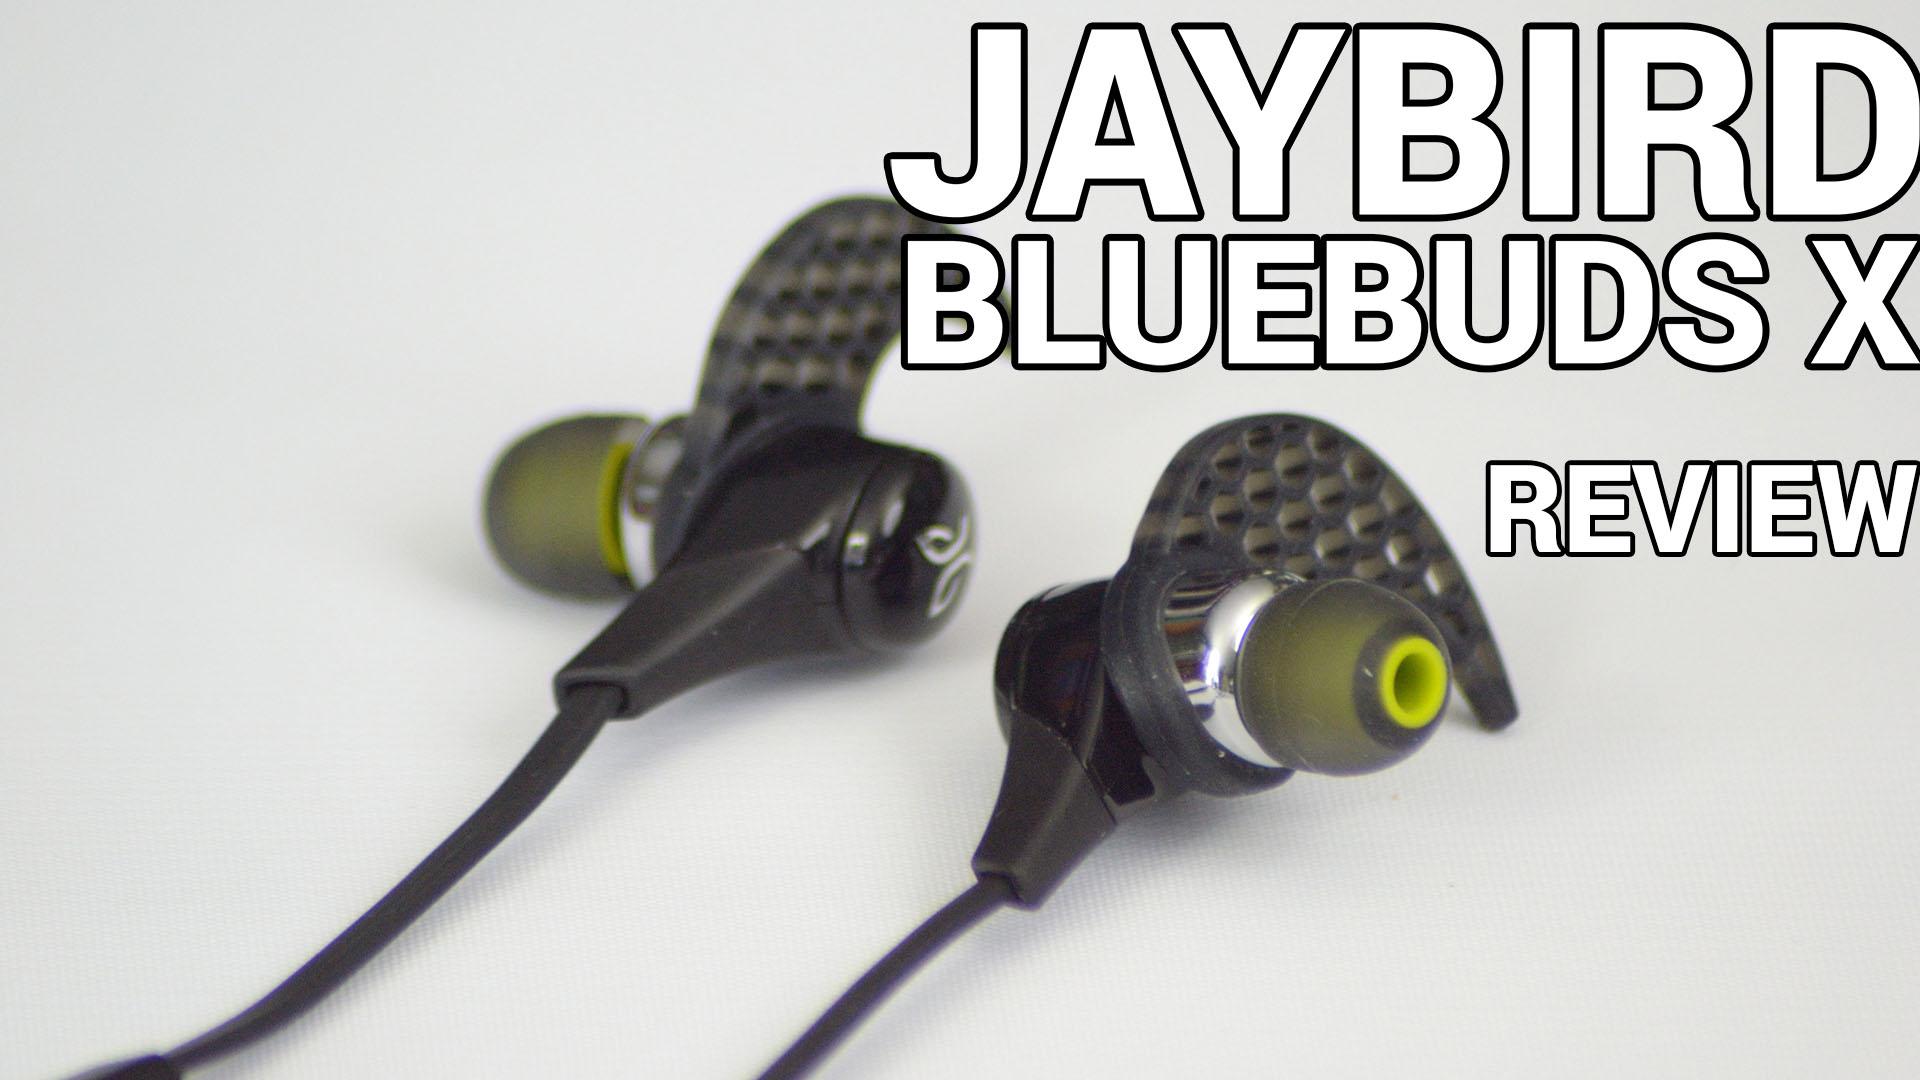 jaybird bluebuds x review headphones club. Black Bedroom Furniture Sets. Home Design Ideas